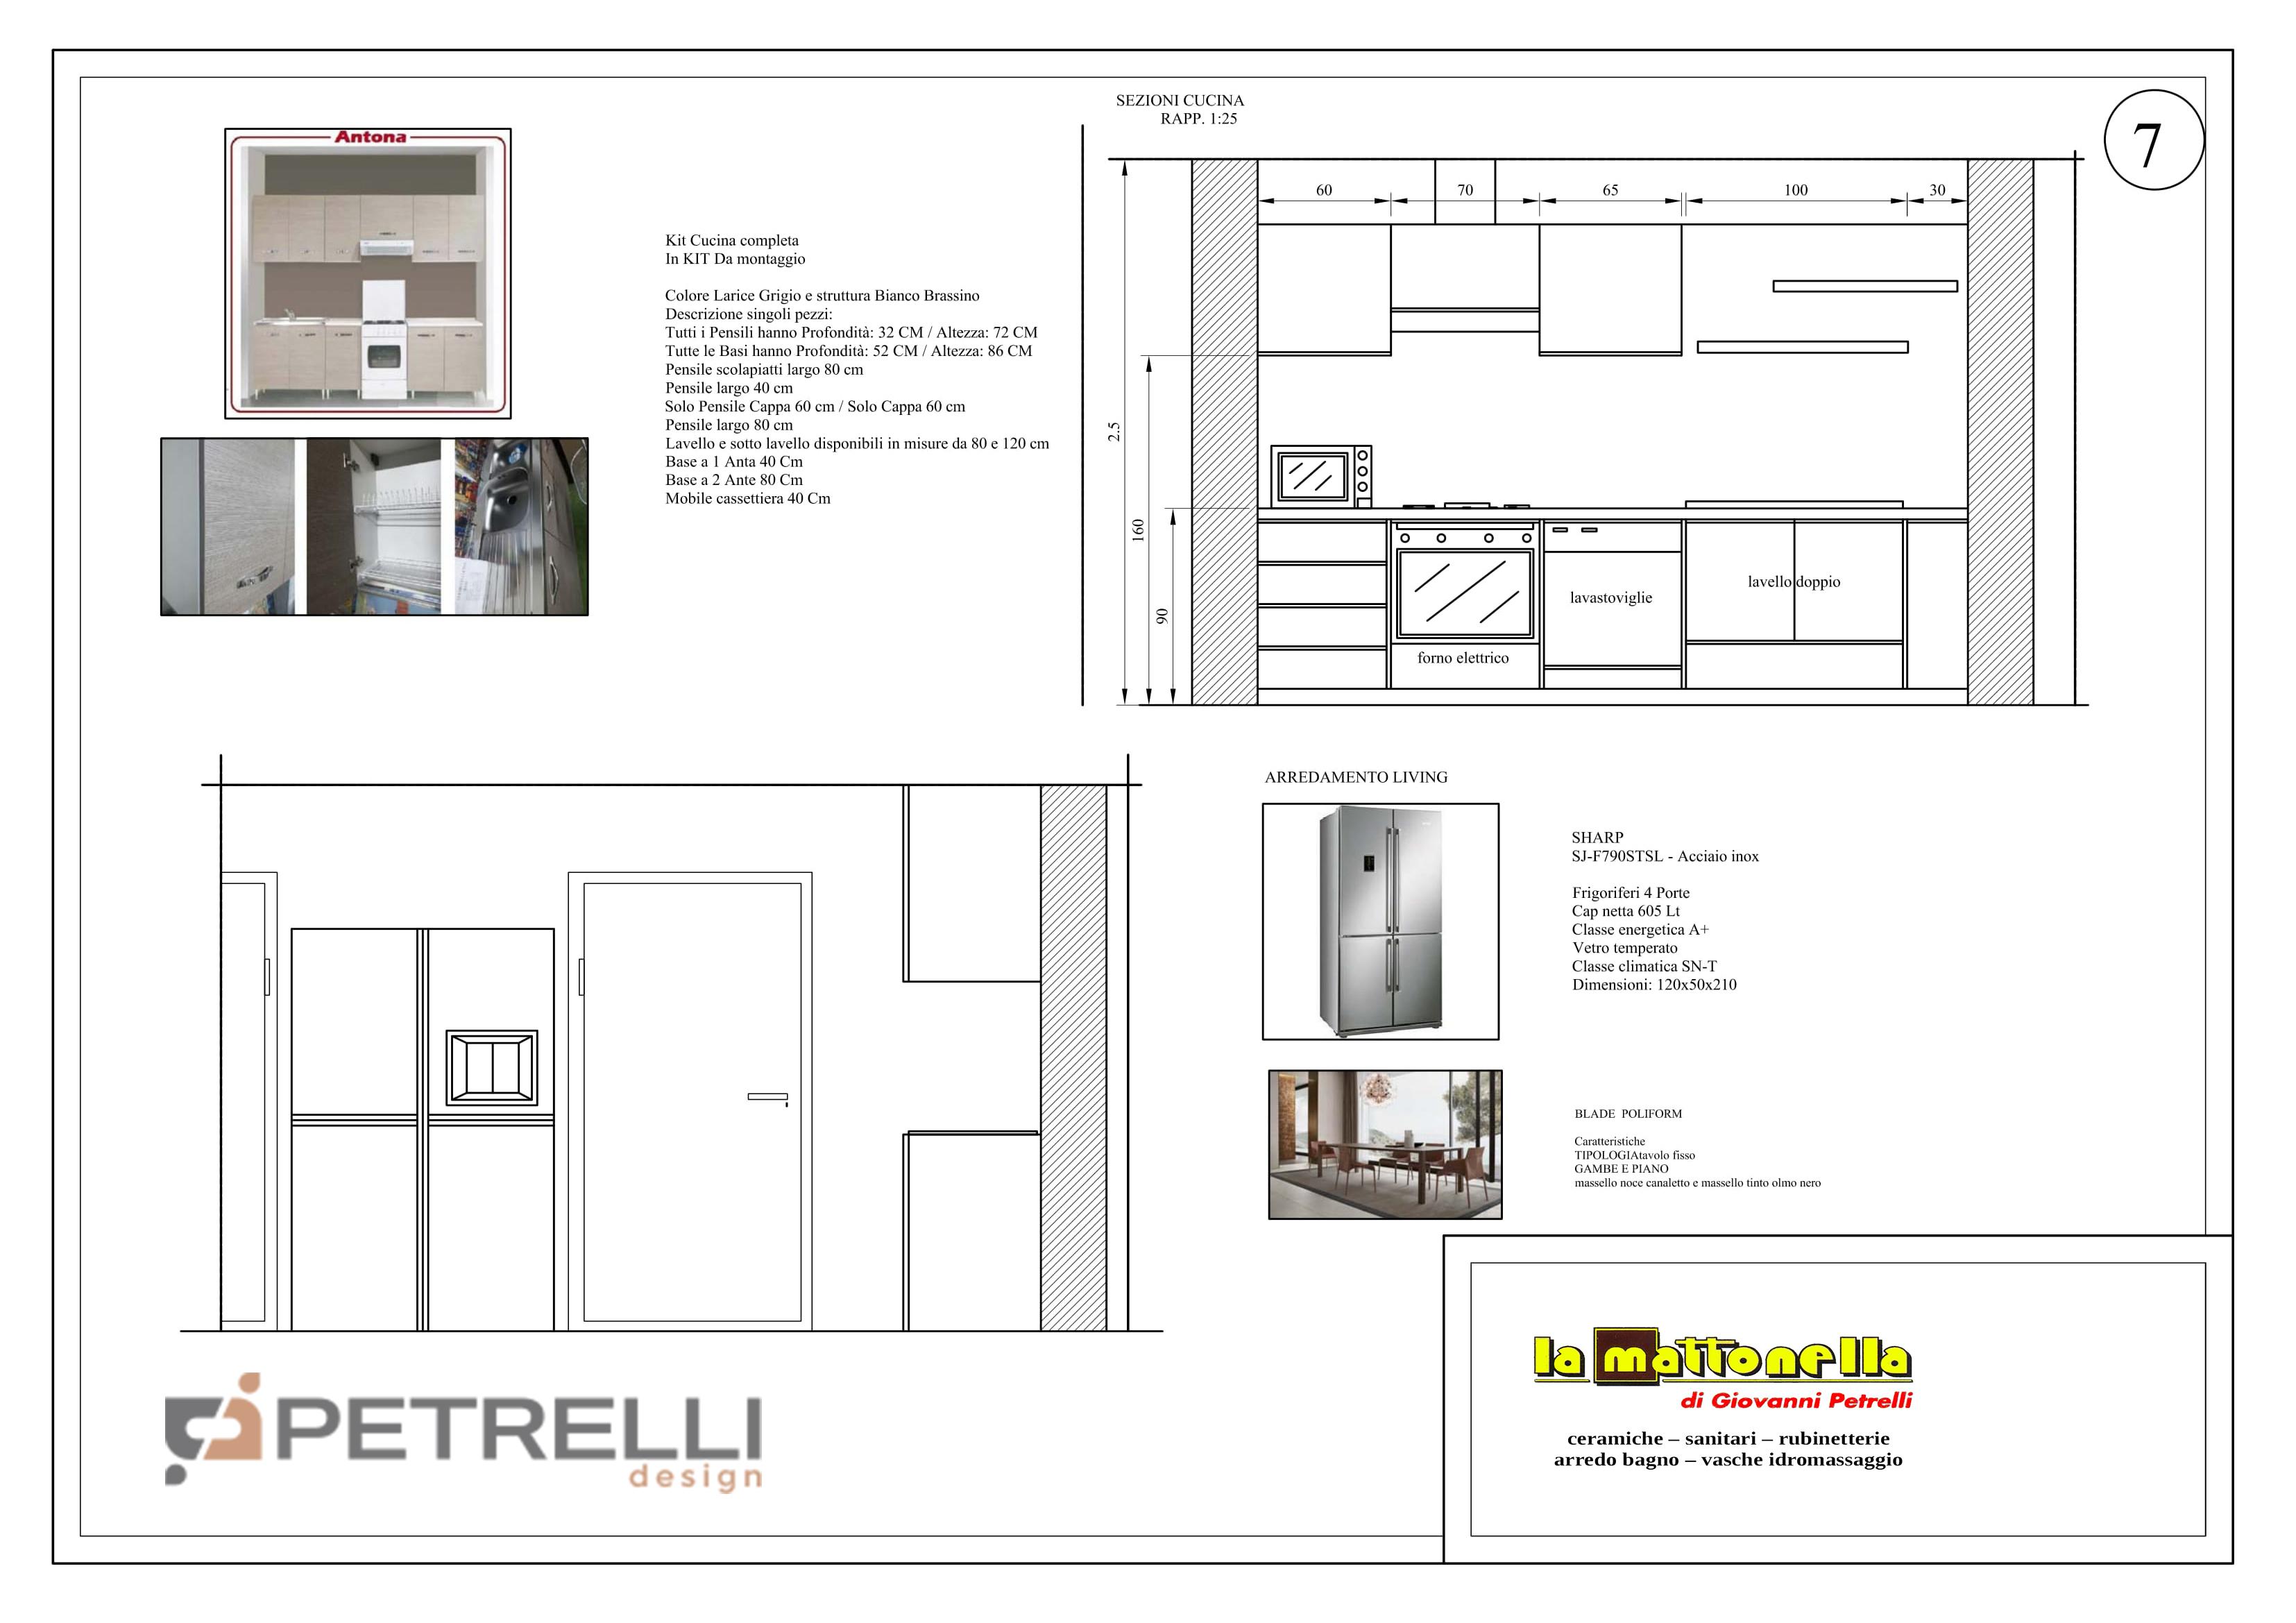 RistRutturatION 2 - Interior - 6 -PetrelliDesign